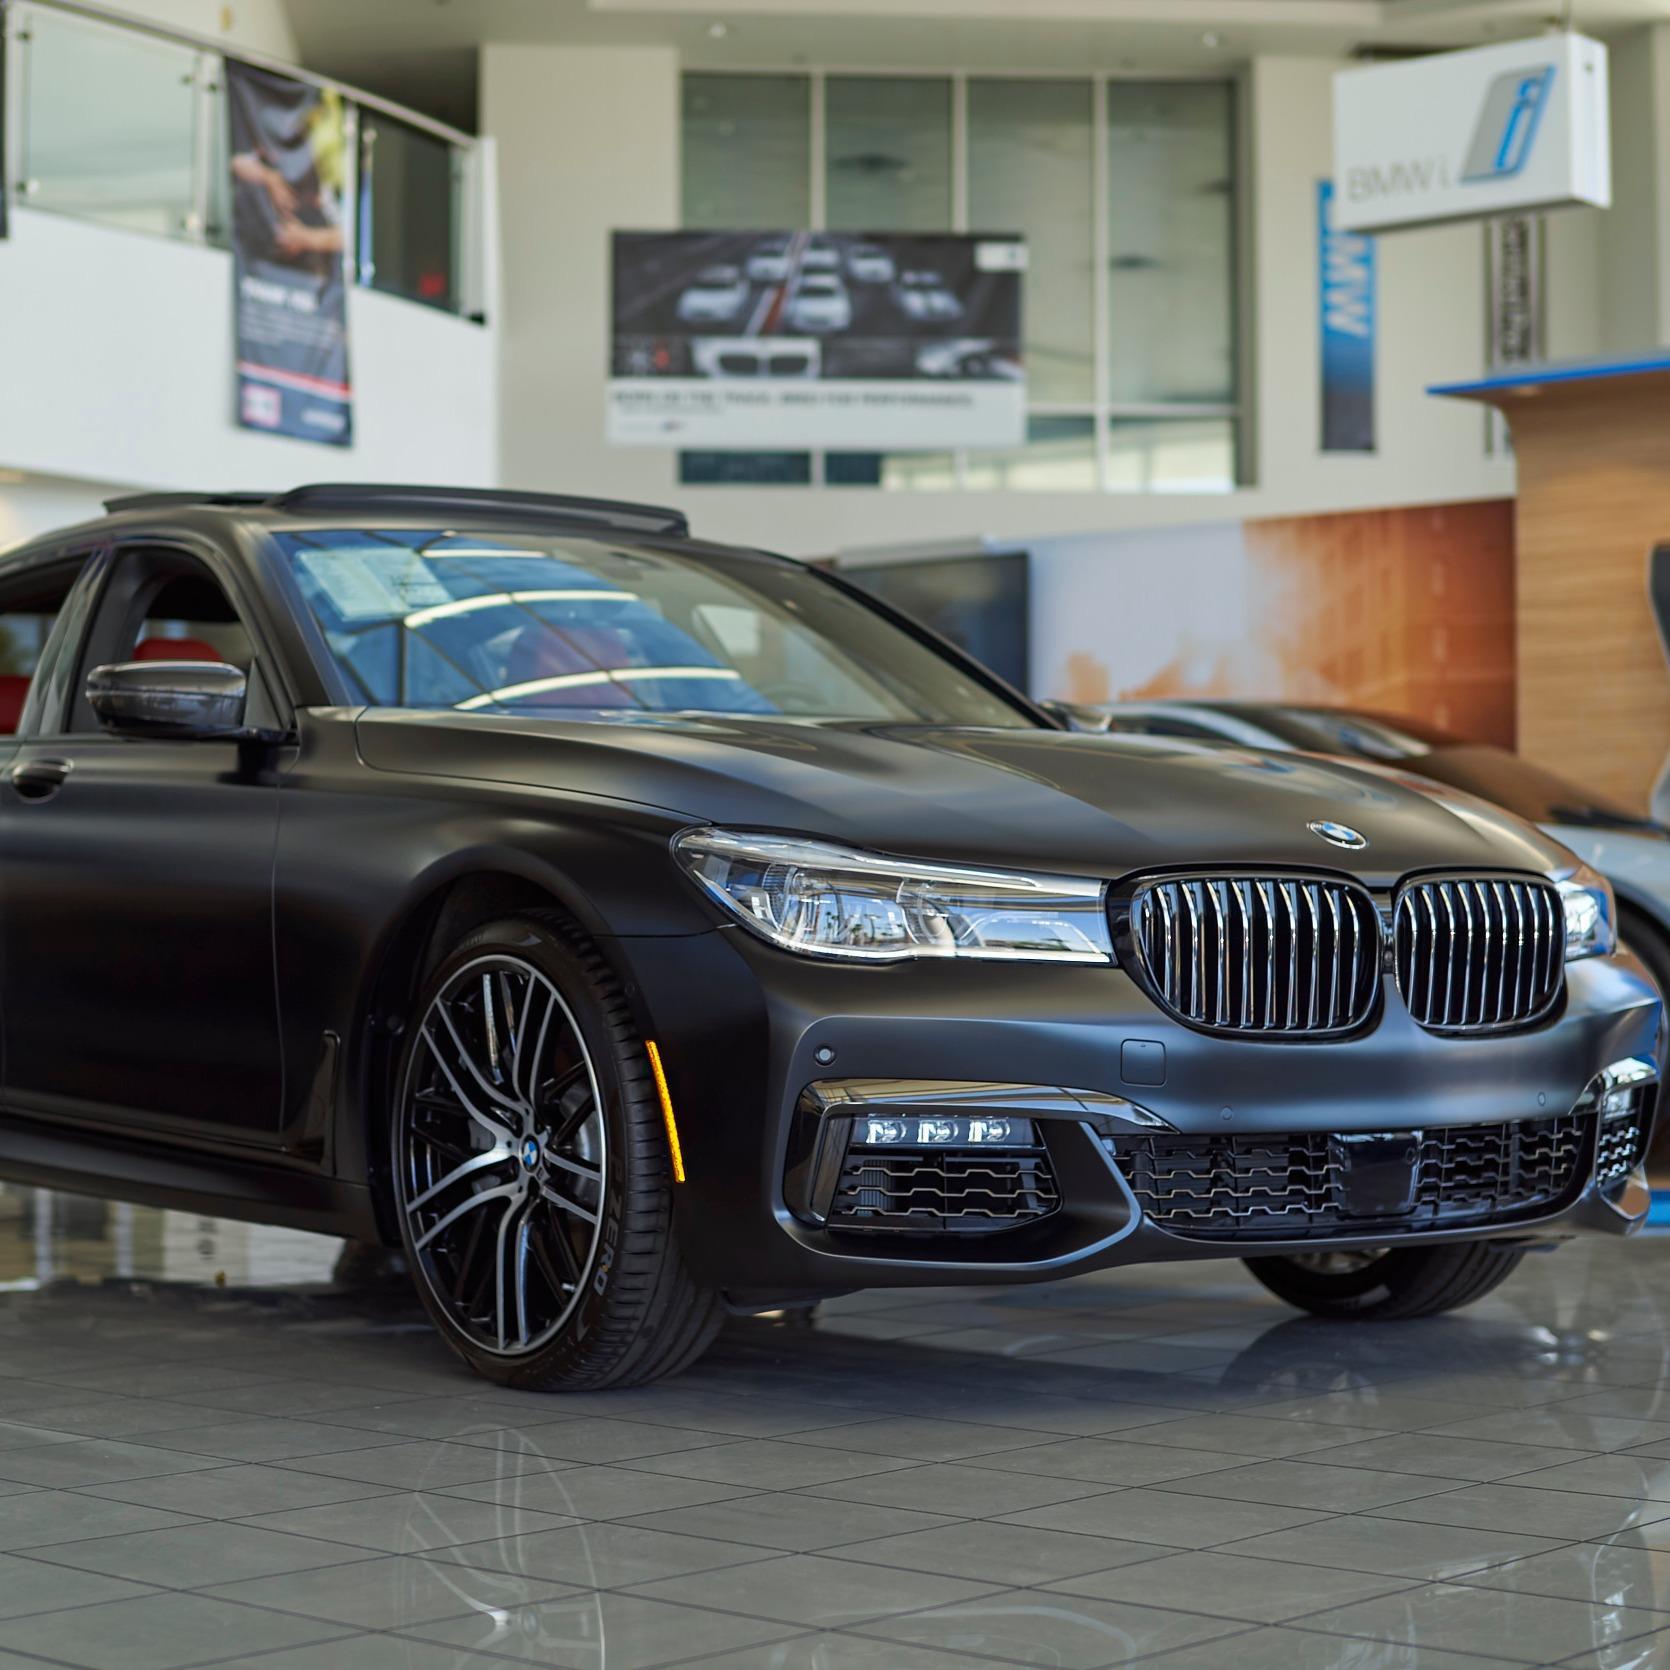 image of the BMW of Las Vegas